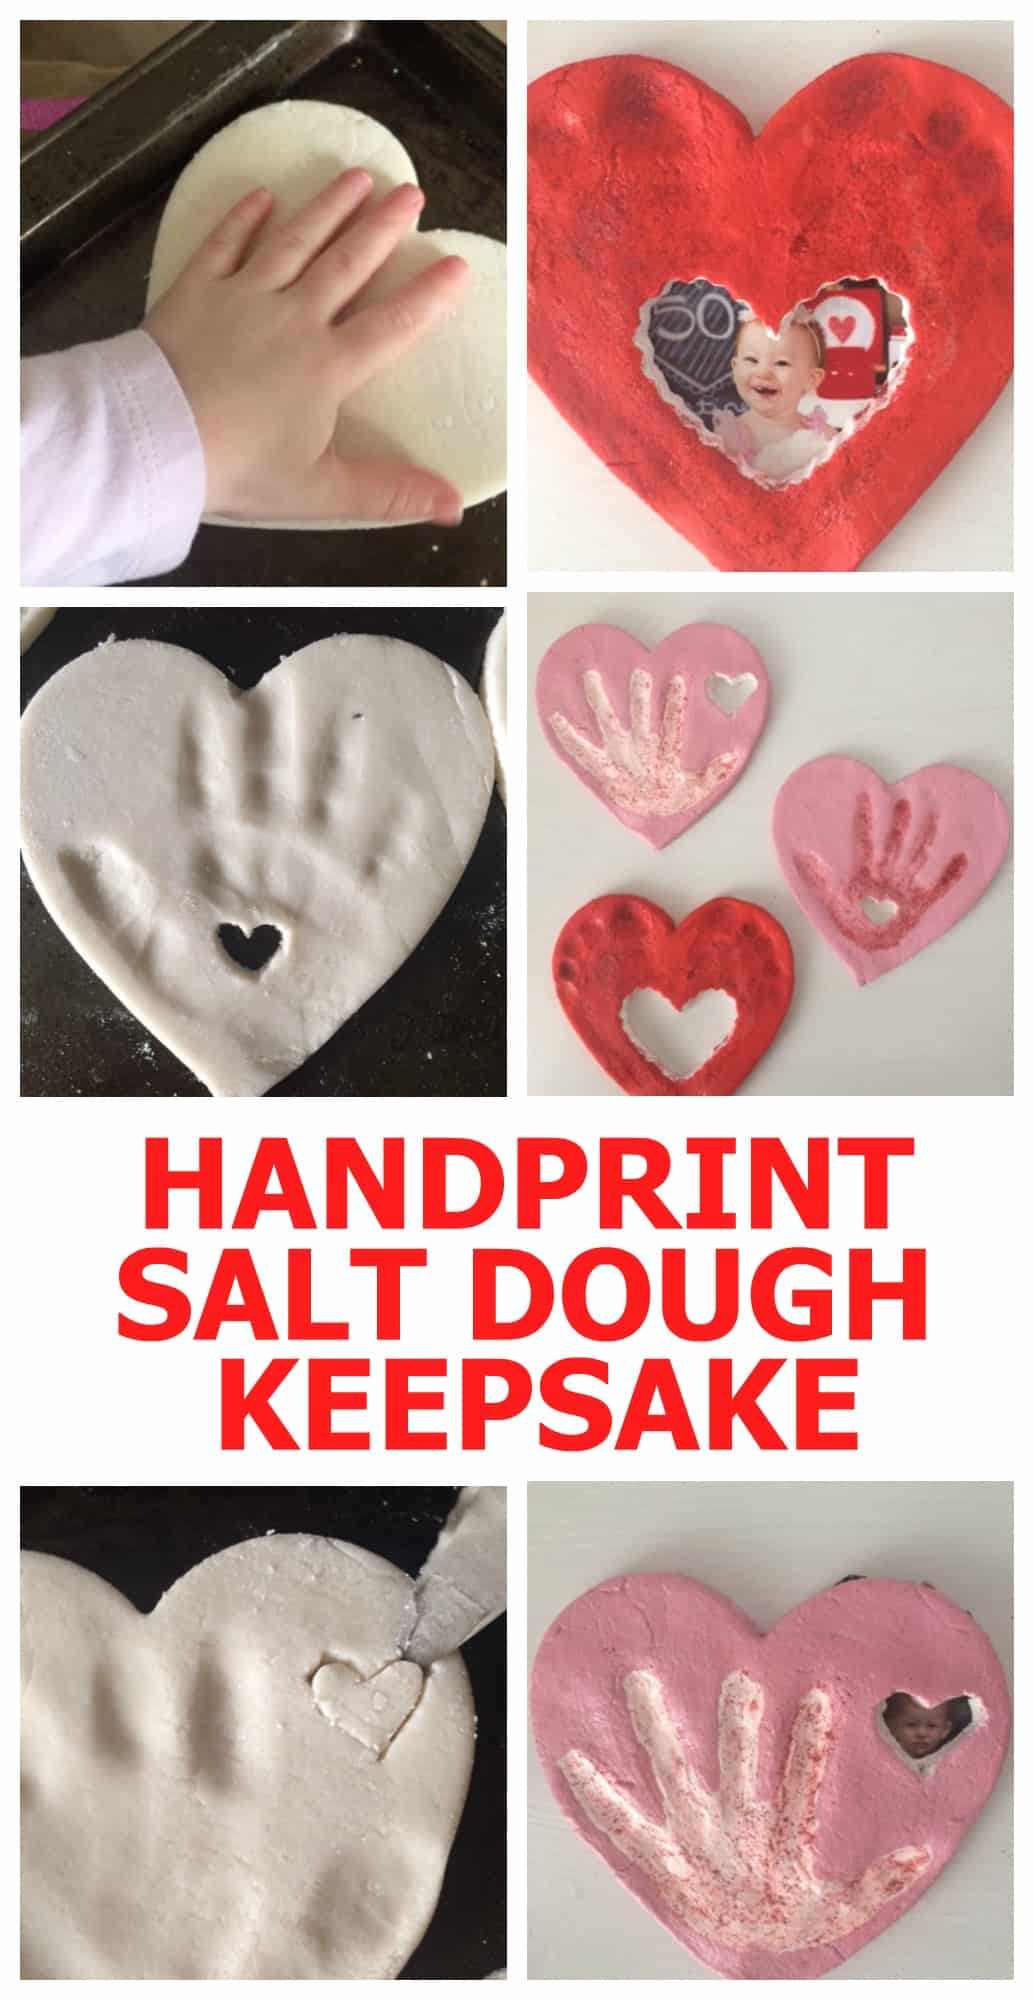 Heart-Shaped Hand print Photo Frames